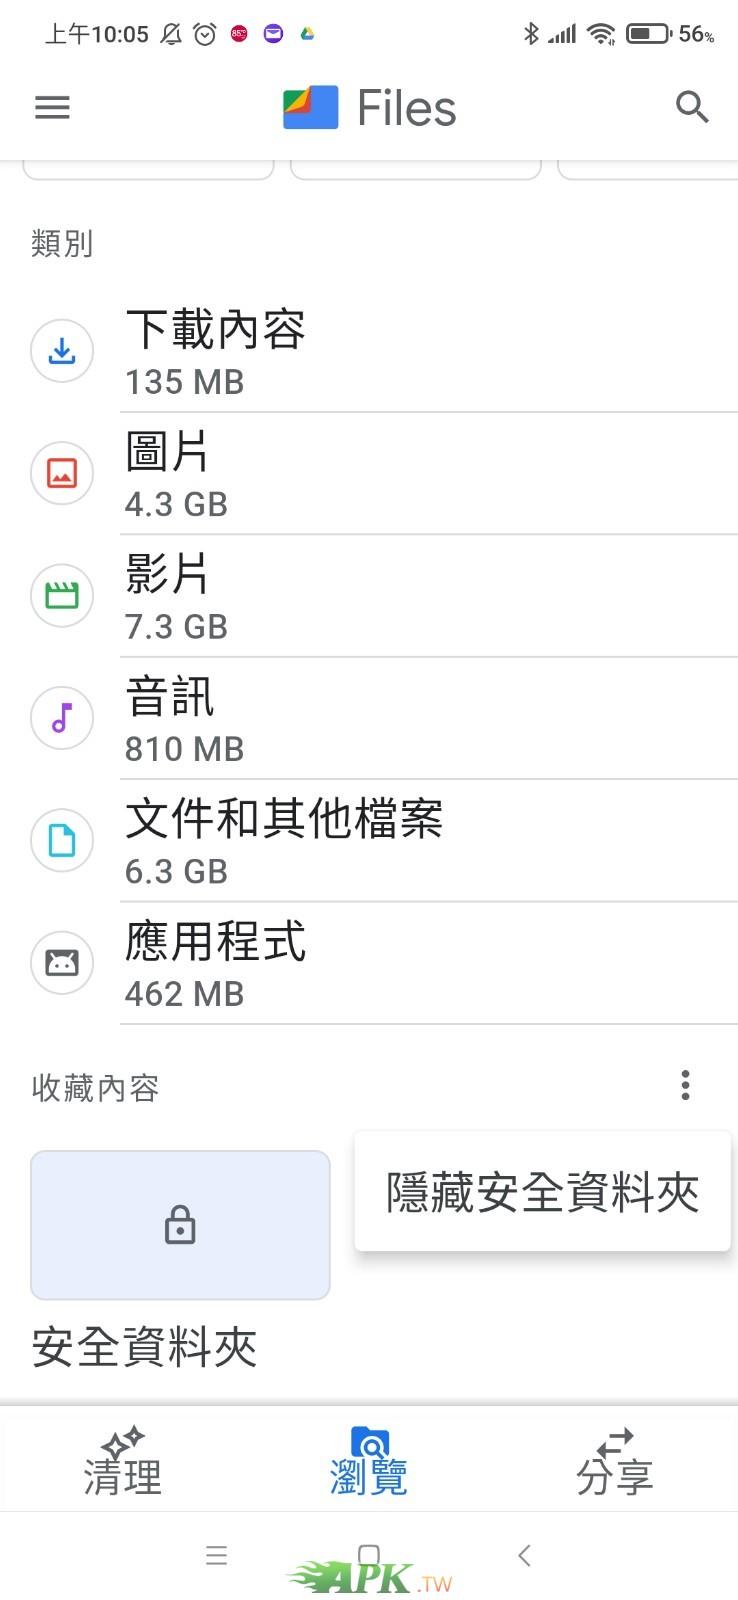 Screenshot_2021-05-12-10-05-32-998_com.google.android.apps.nbu.files.jpg